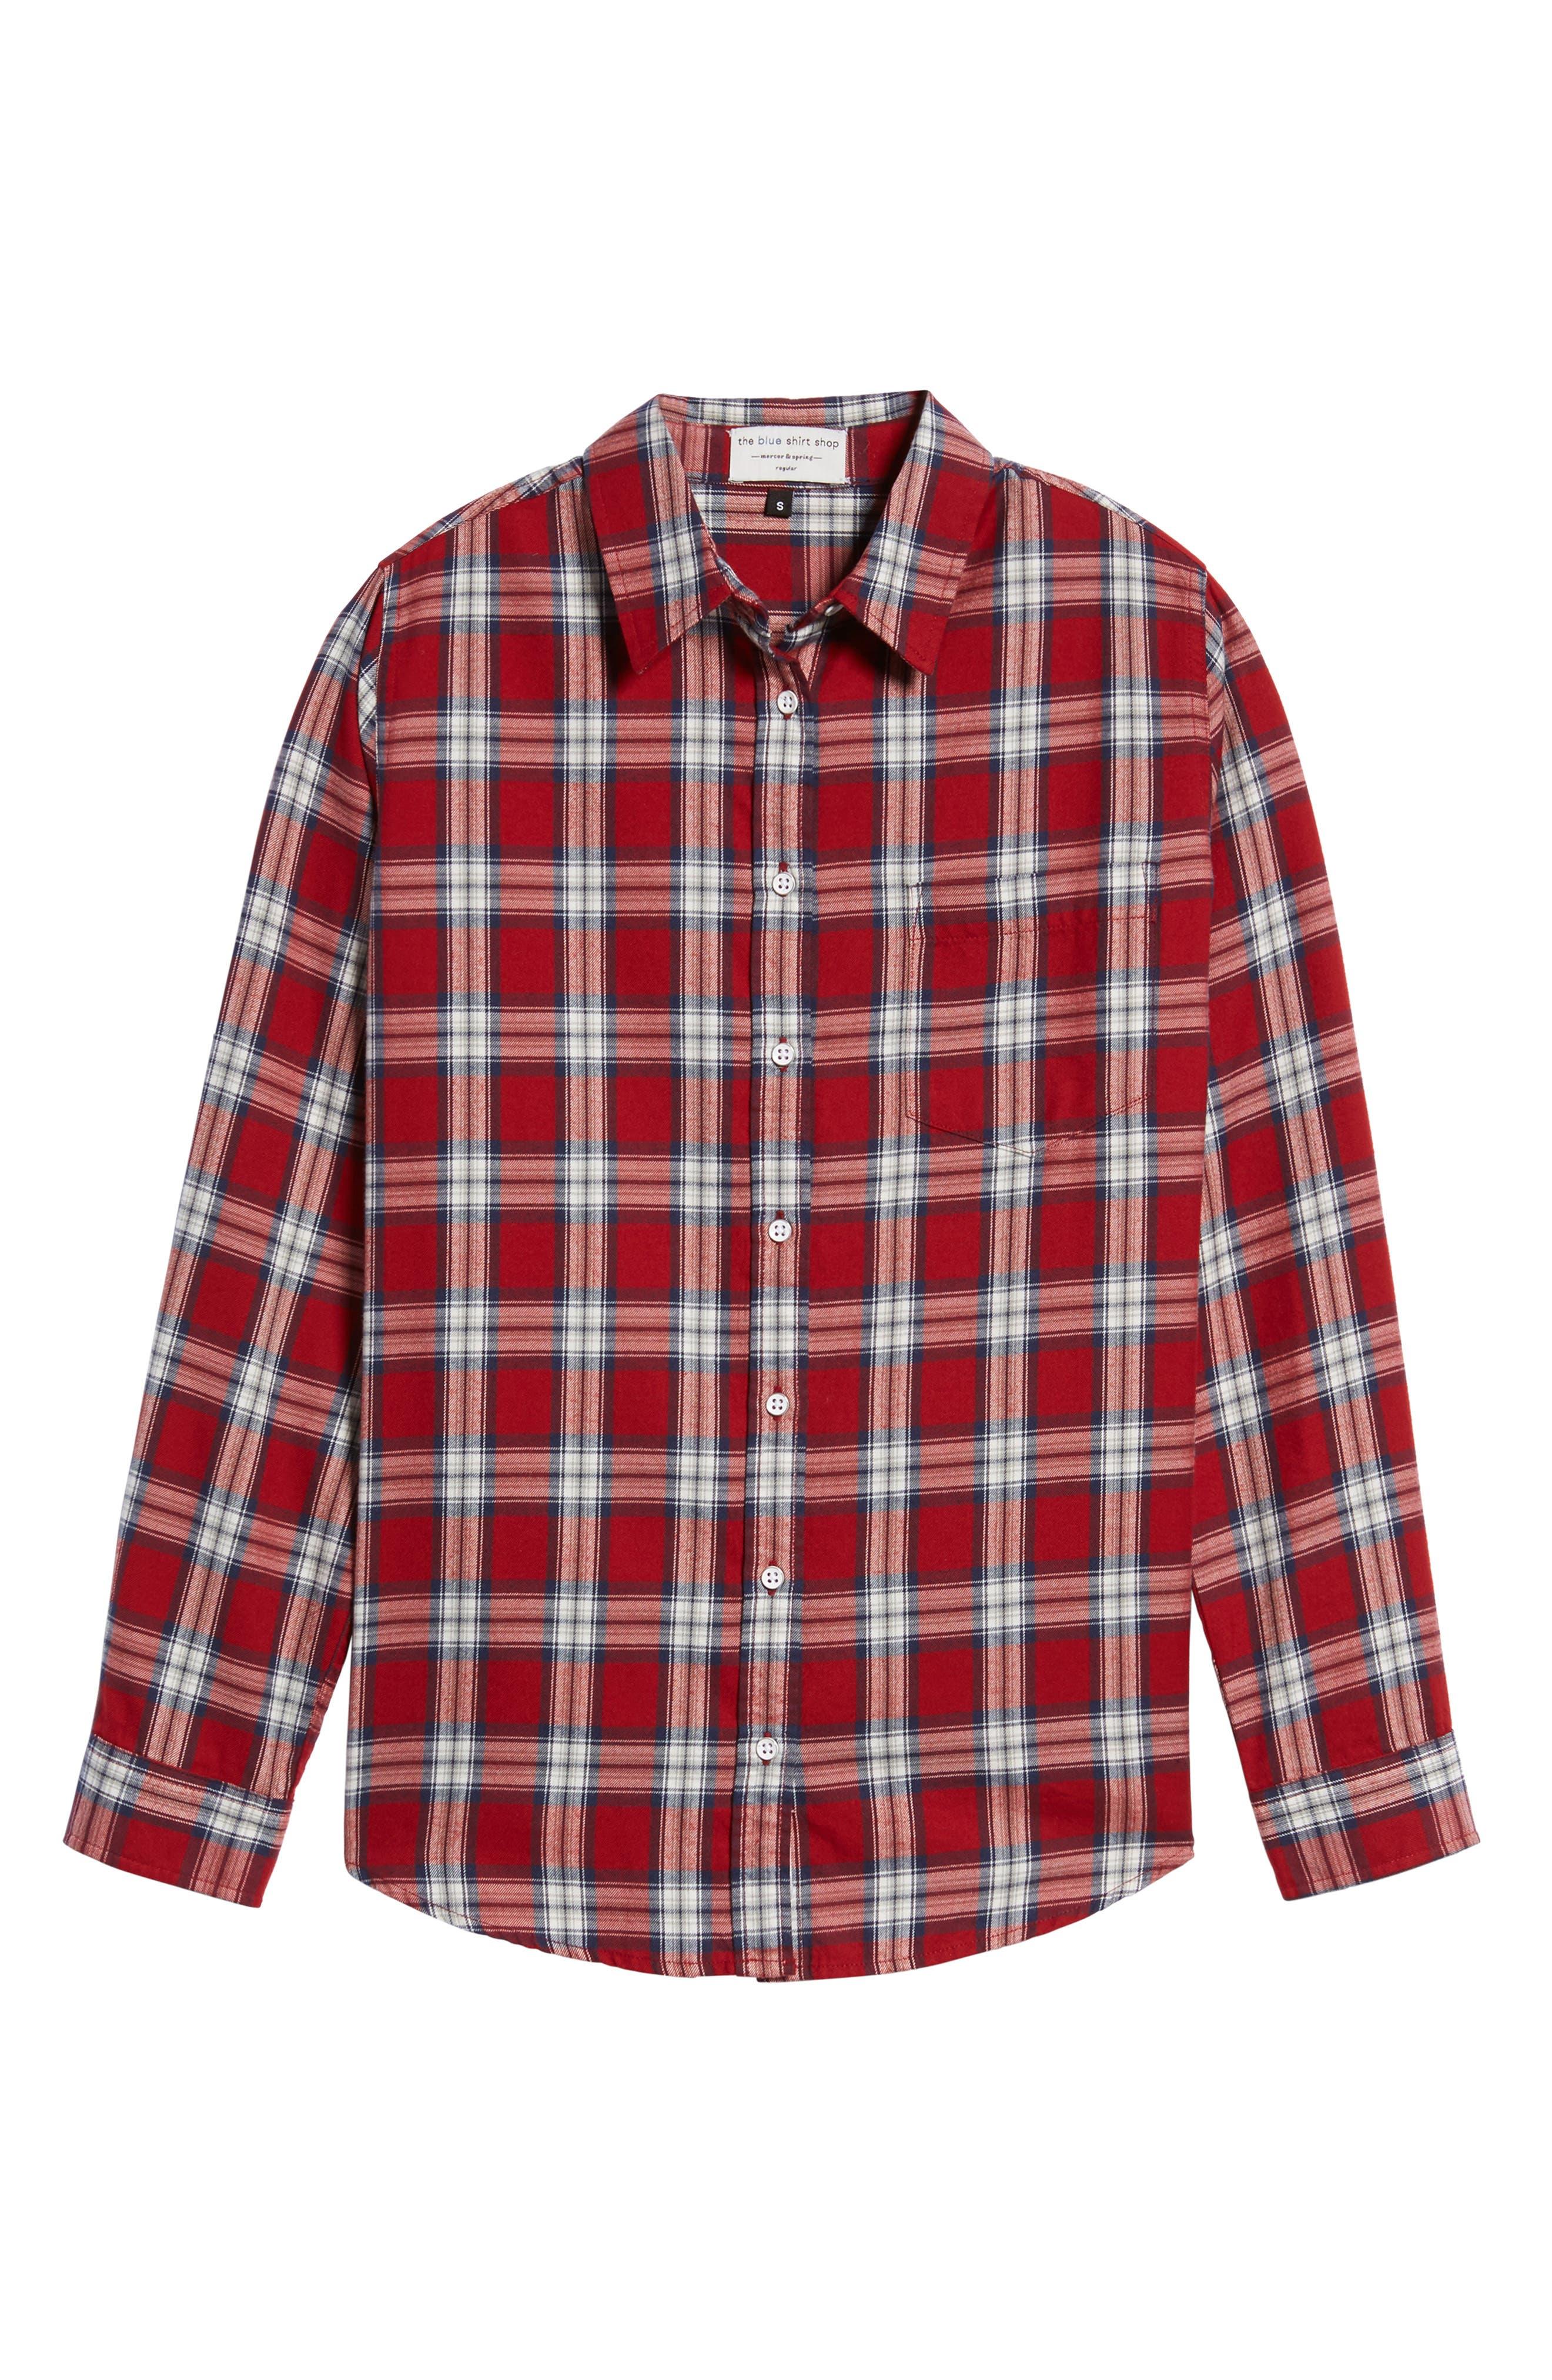 Mercer & Spring Plaid Shirt,                             Alternate thumbnail 6, color,                             Red Plaid